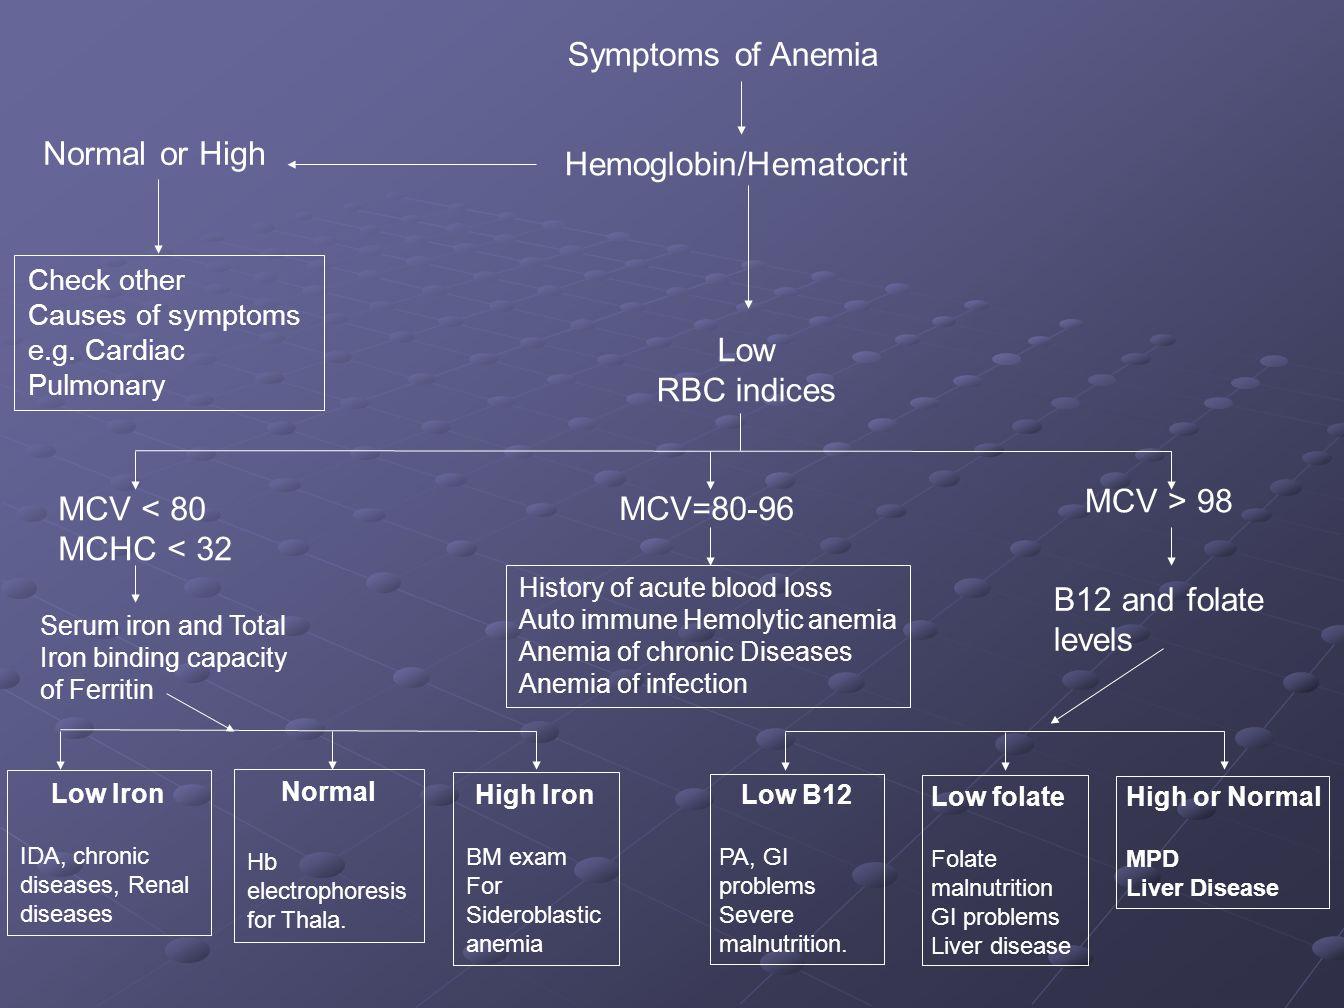 Hemoglobin/Hematocrit